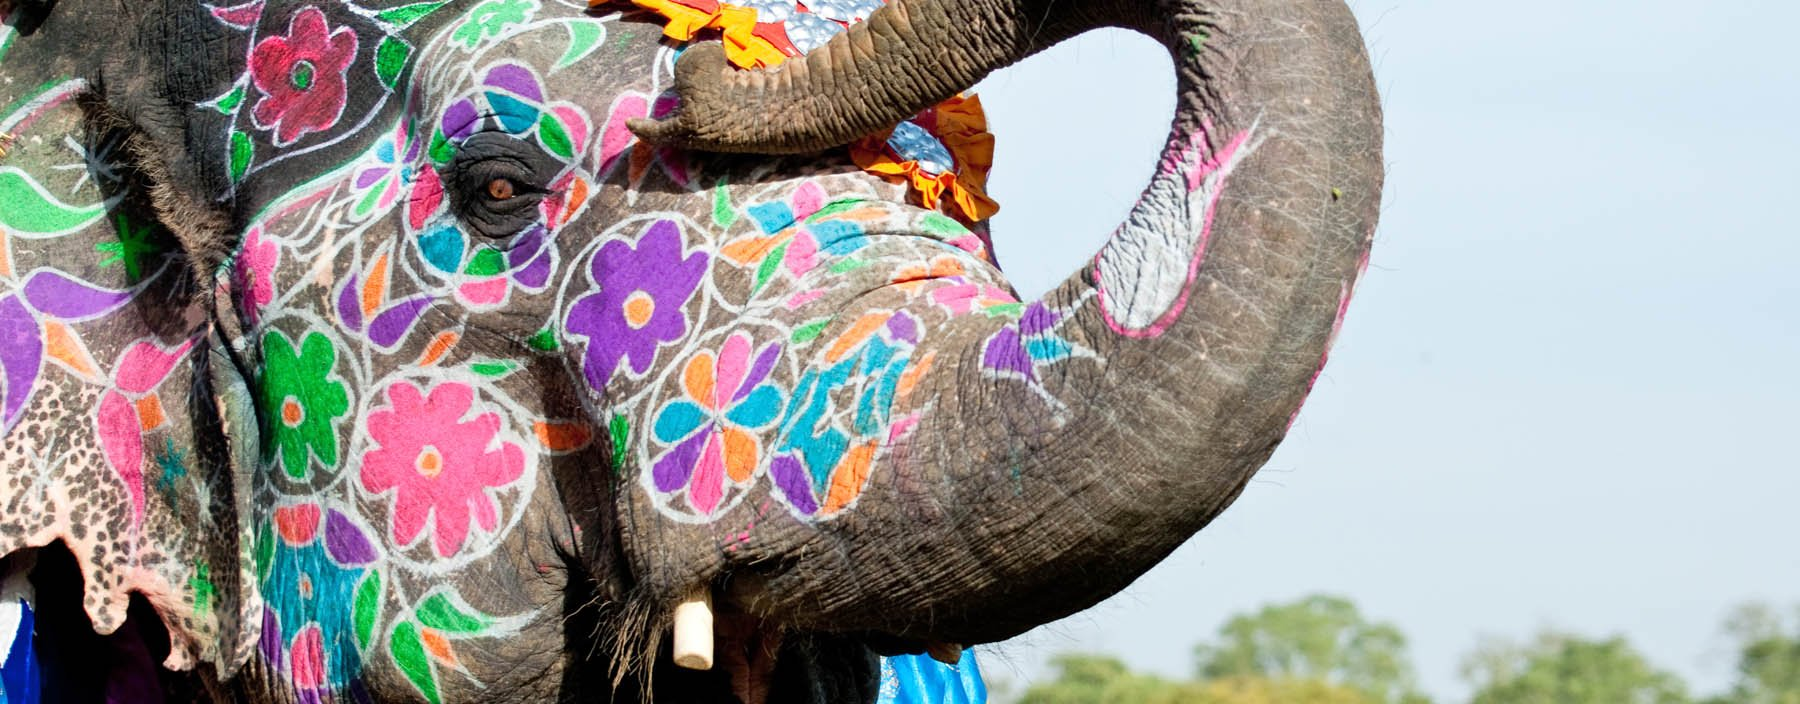 in, jaipur, painted elephant at the elephant festival.jpg